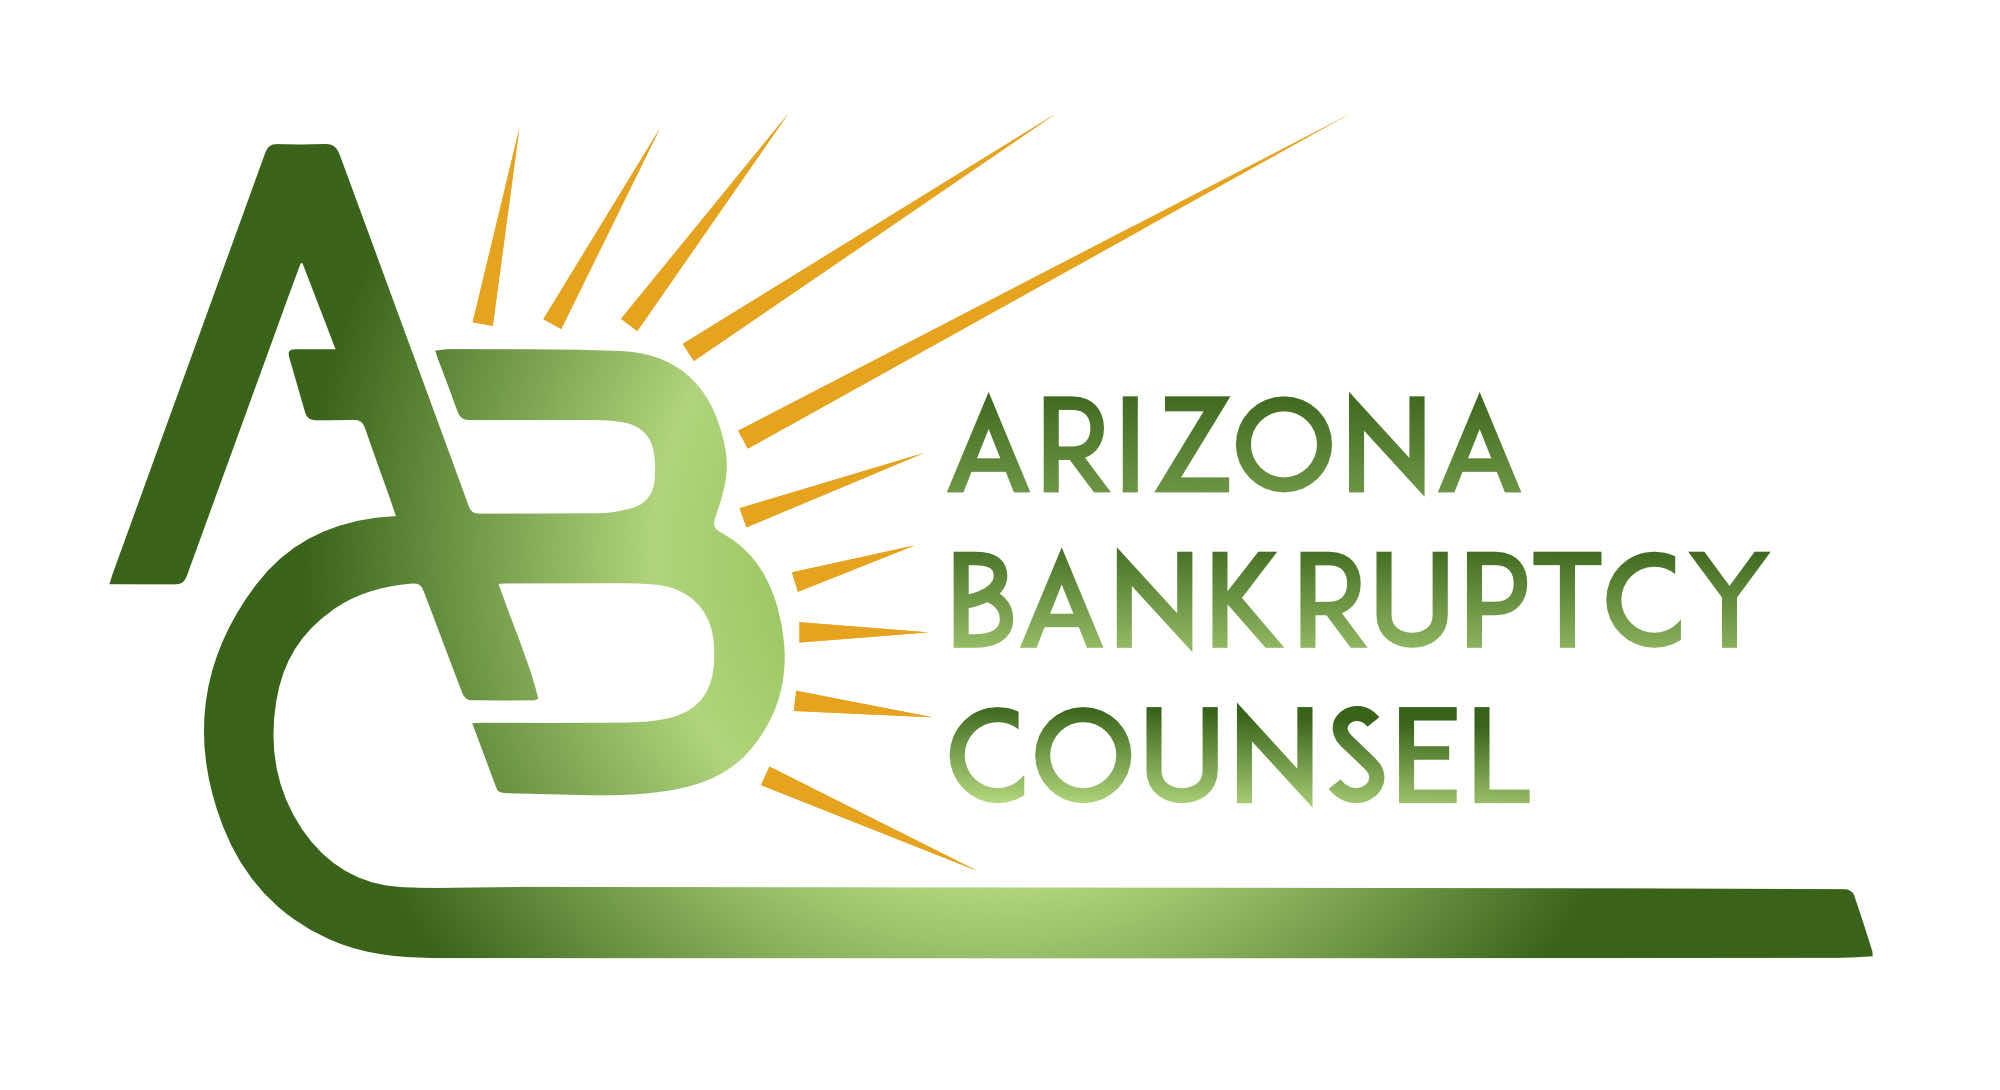 Arizona Bankruptcy Counsel